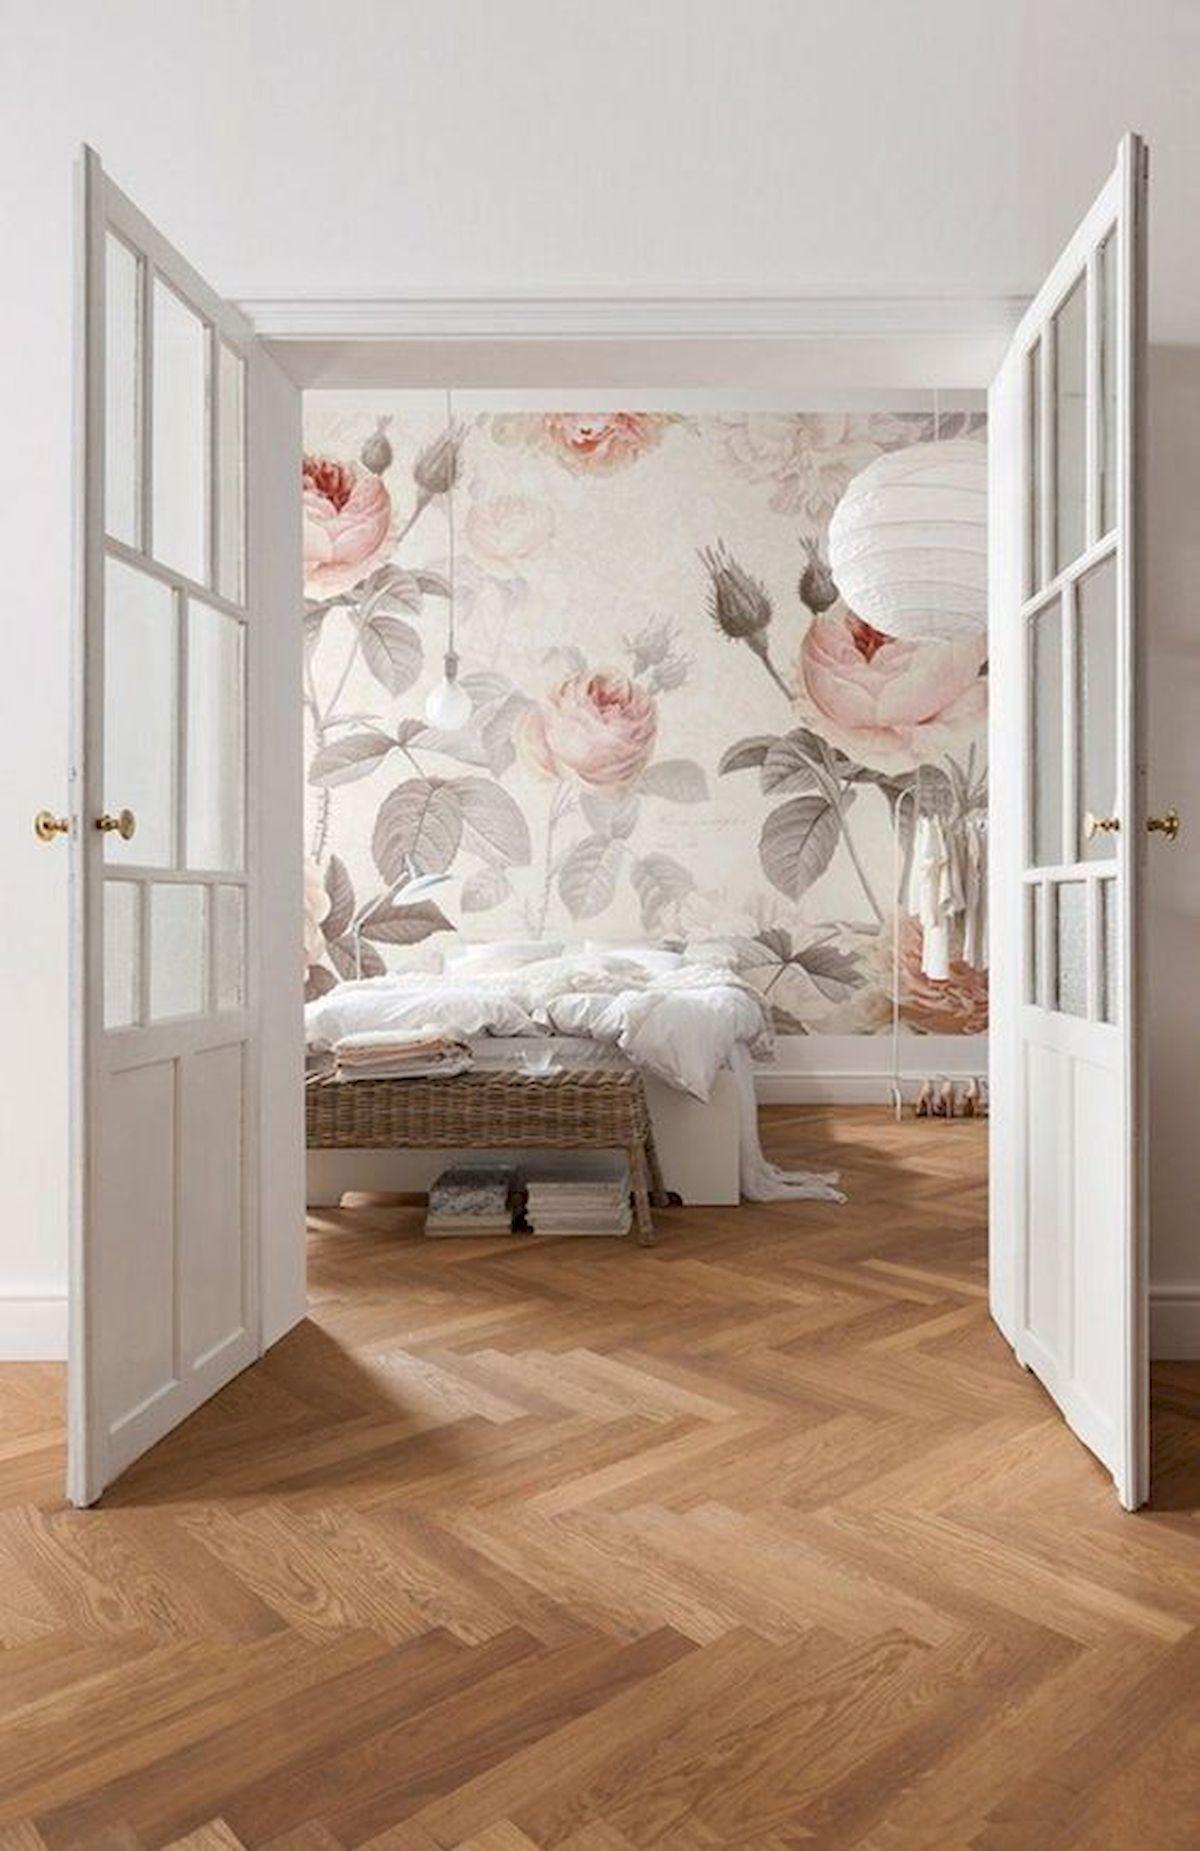 40 Amazing Farmhouse Boho Bedroom Design And Decor Ideas (3)